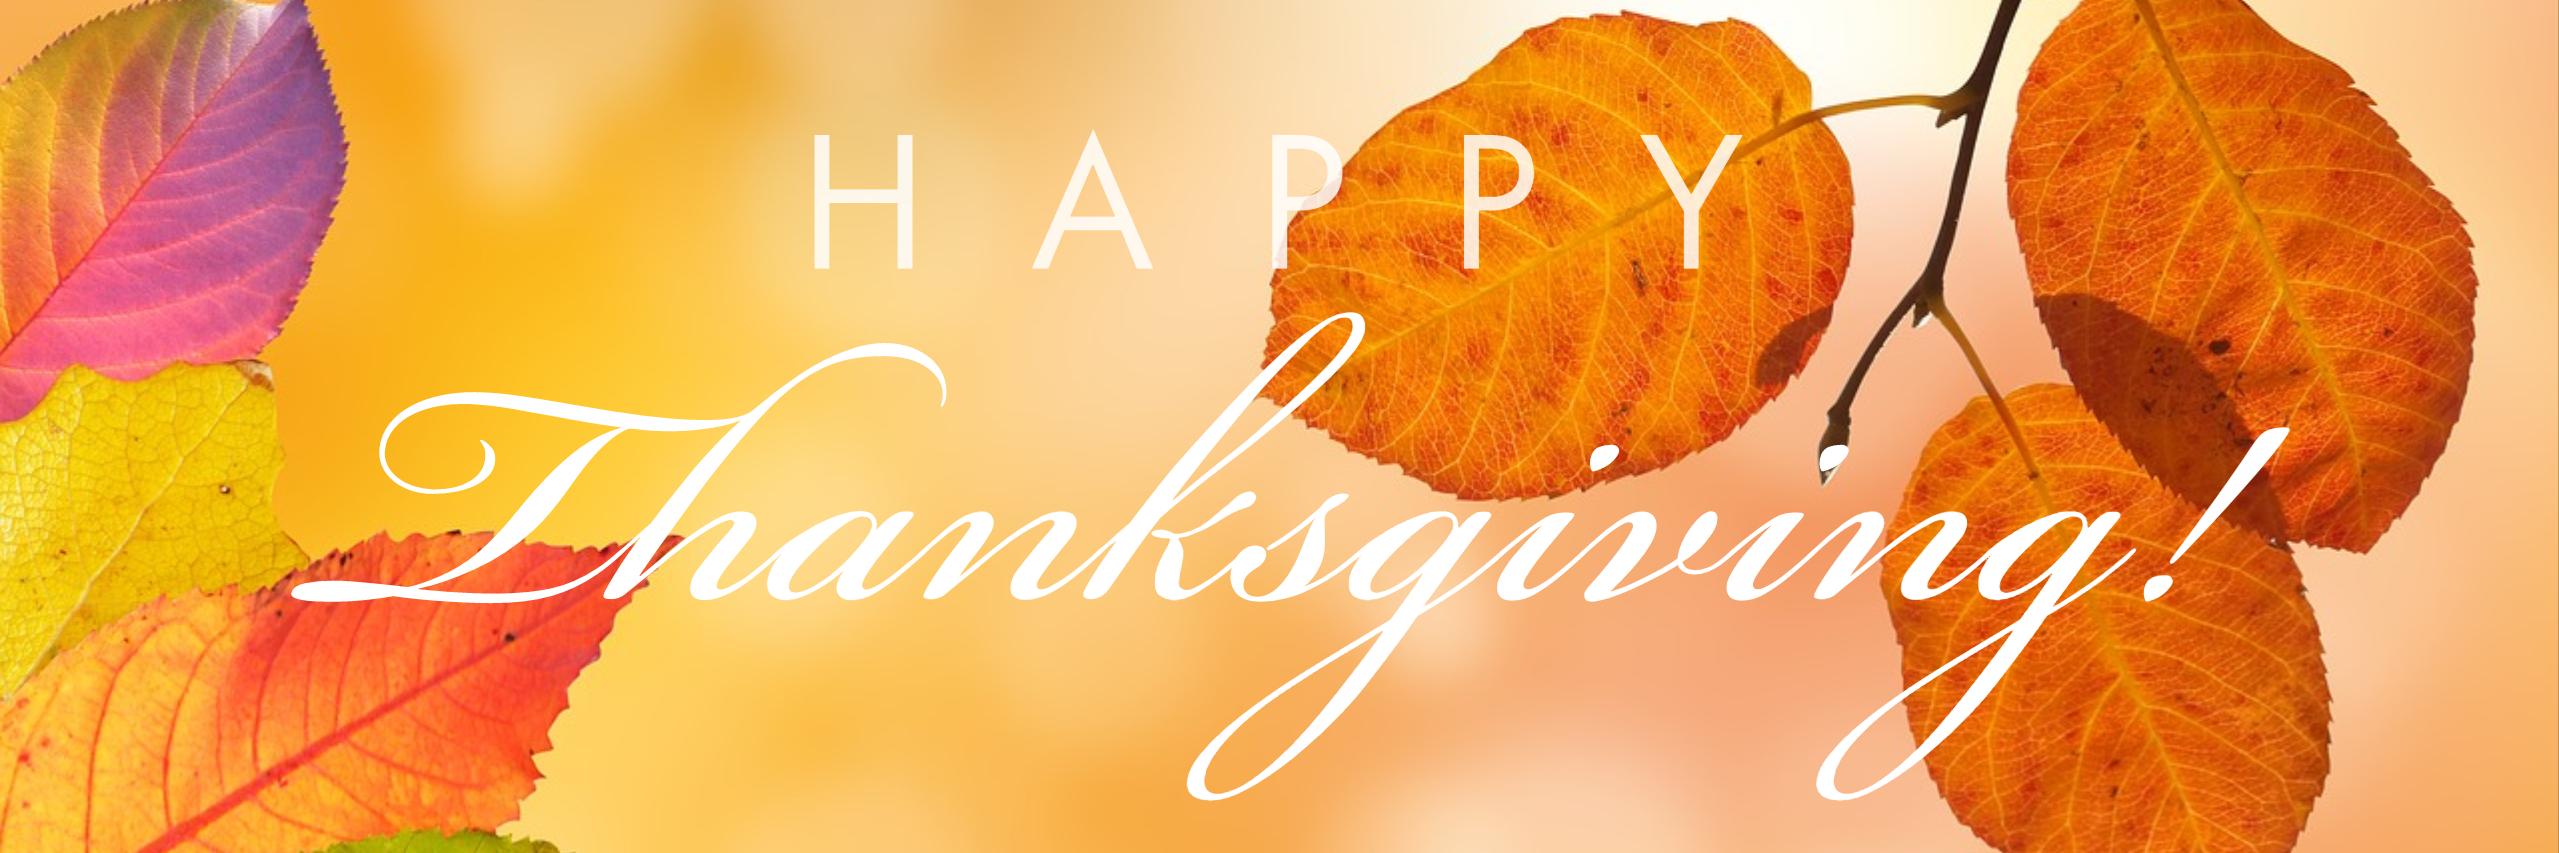 Happy_Thanksgiving_2018.jpg - 1.48 Mb